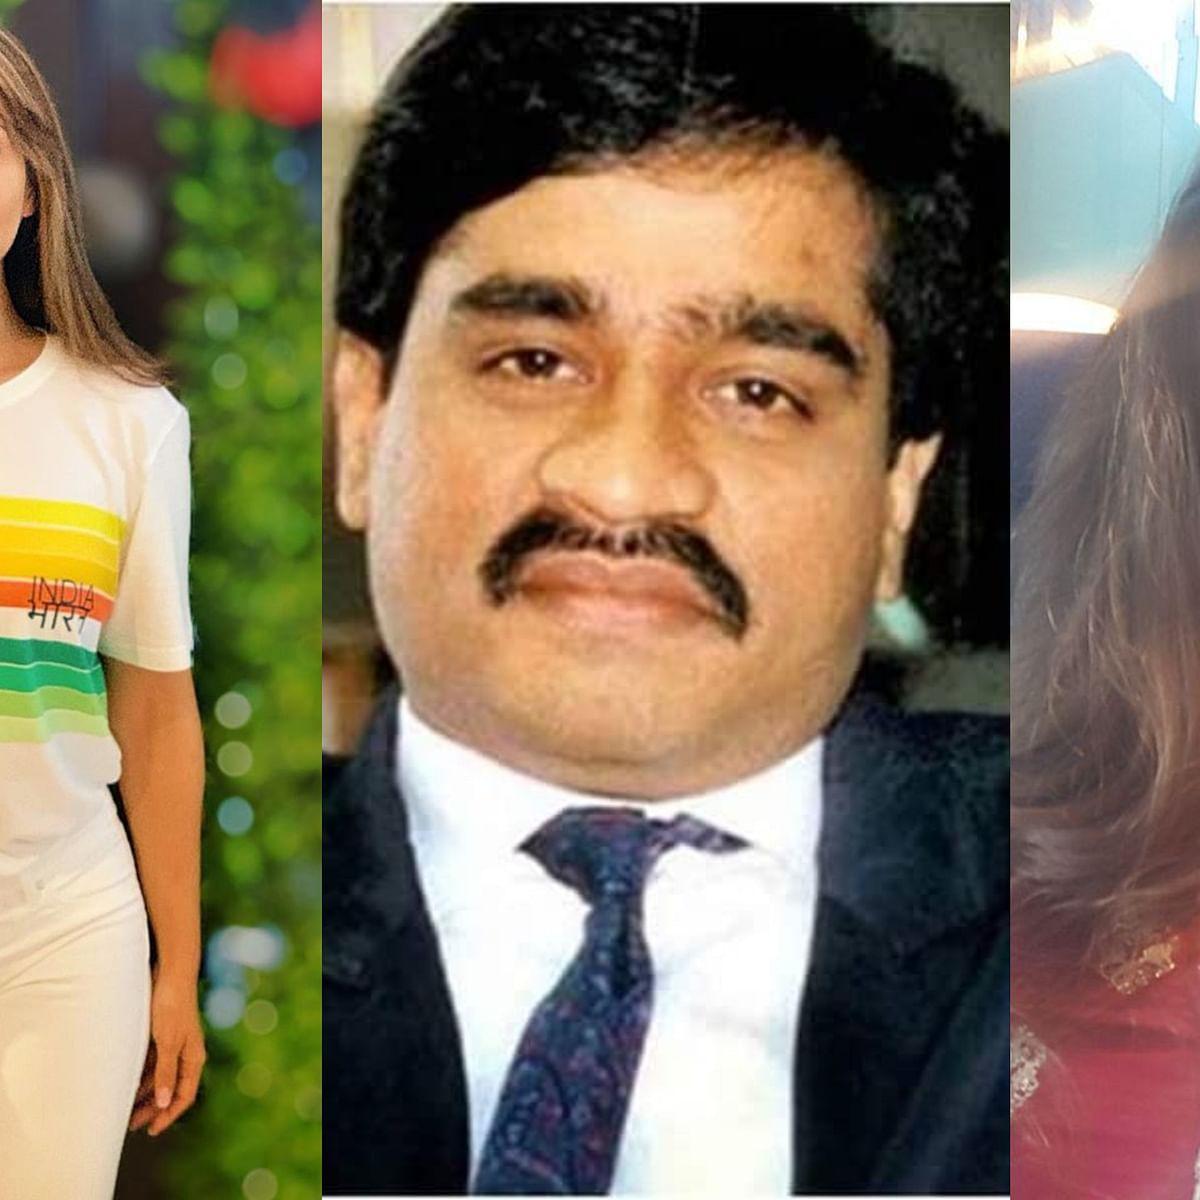 Bollywood-Dawood link emerges as biggest drug cartel in US net